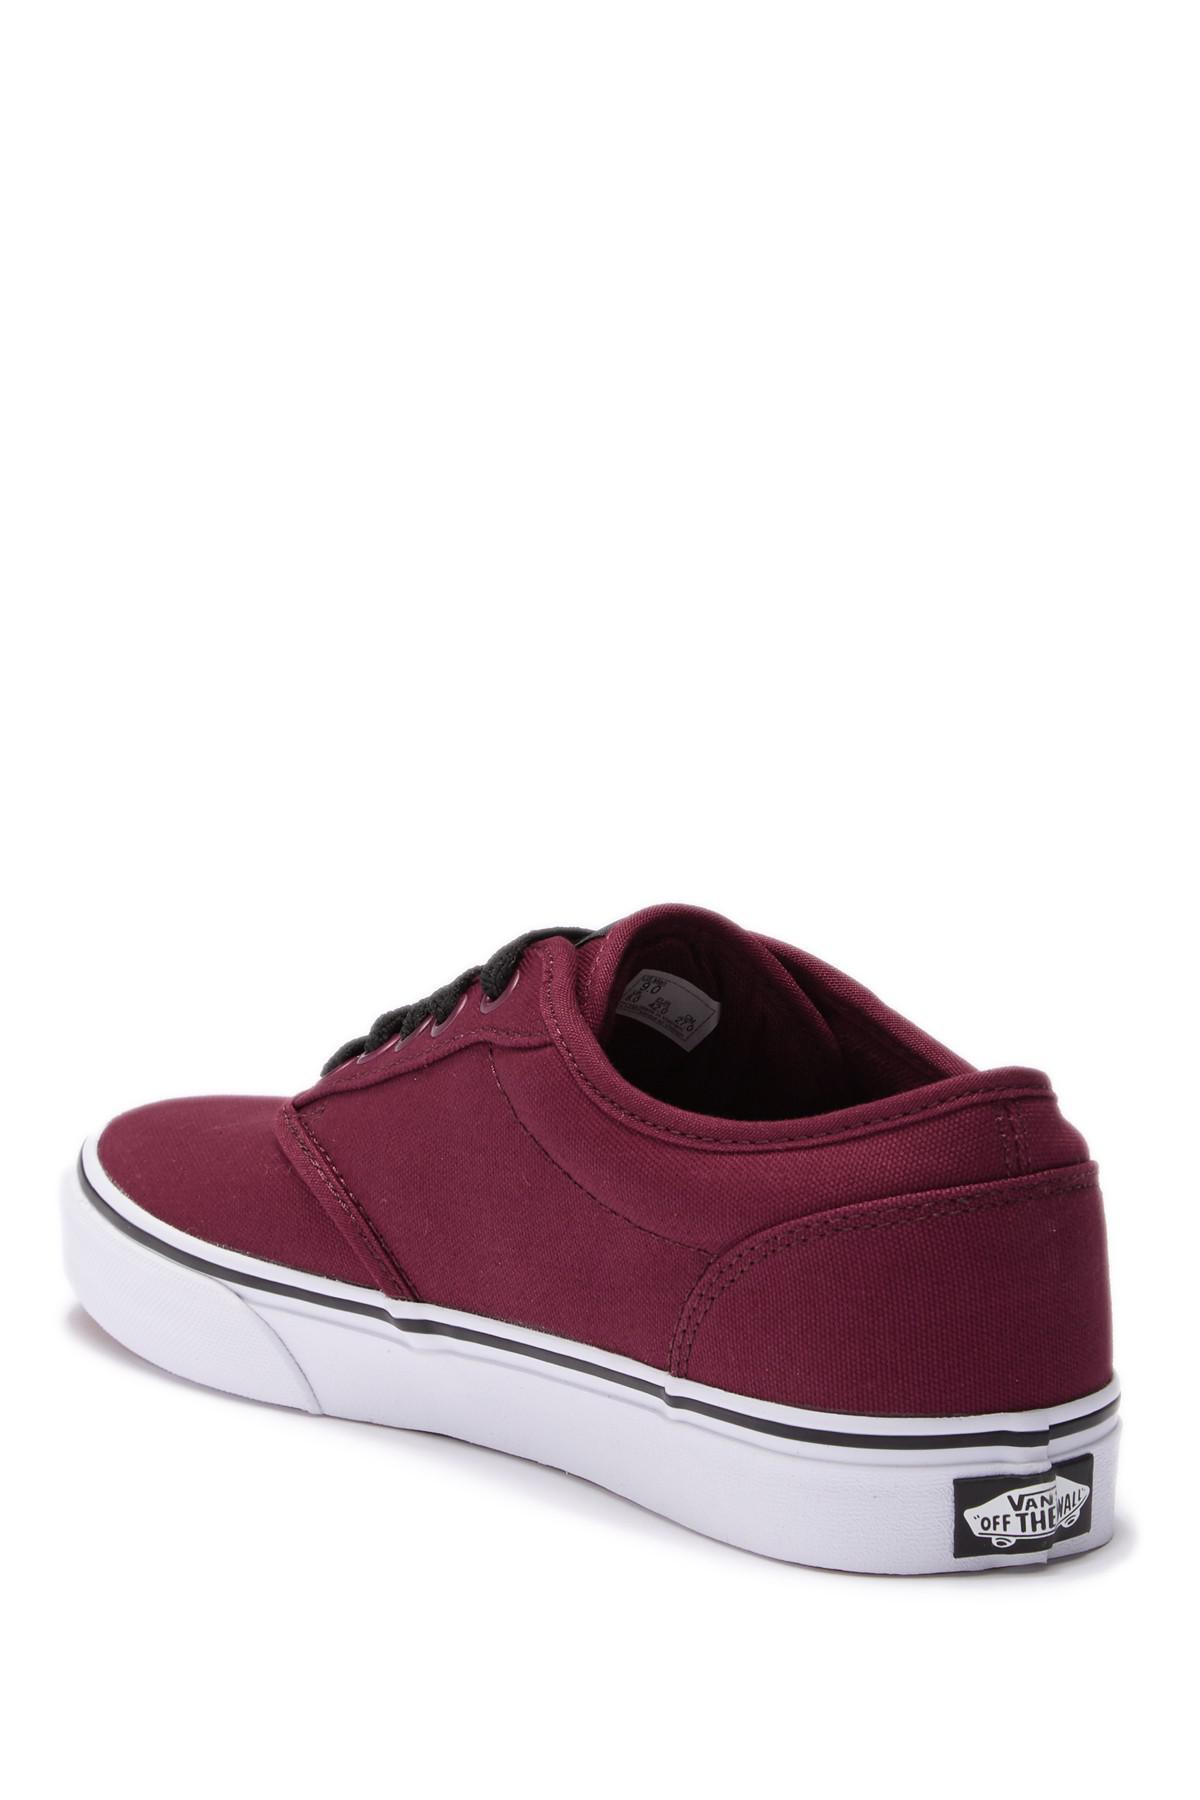 60341ef6f1 Vans - Red Atwood Sneaker for Men - Lyst. View fullscreen